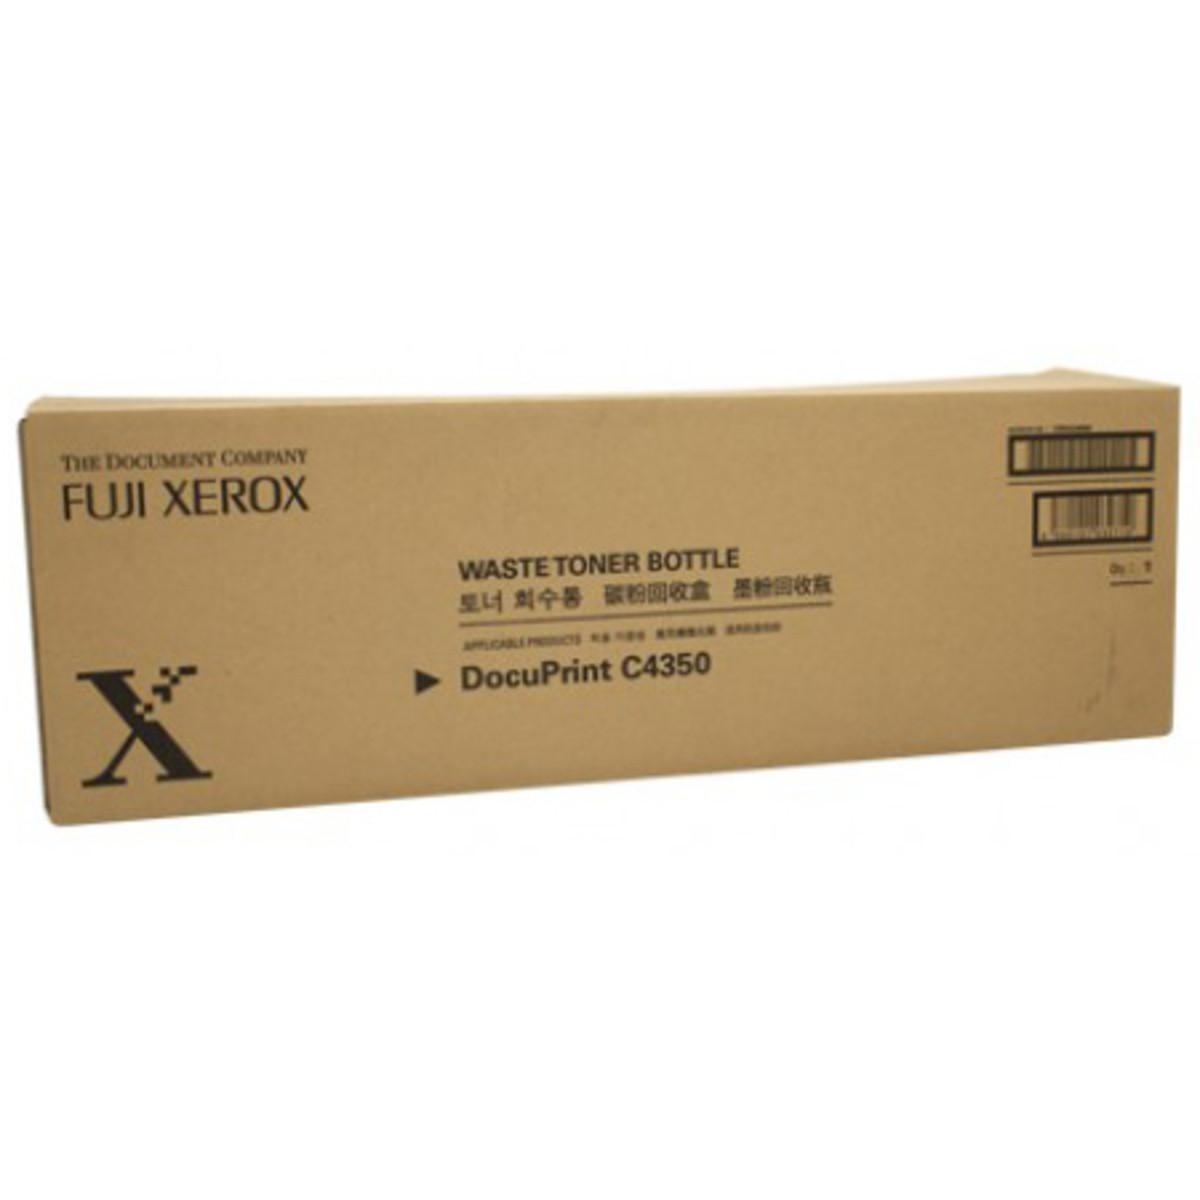 Xerox DPC4350 Toner Reclaim Bottle